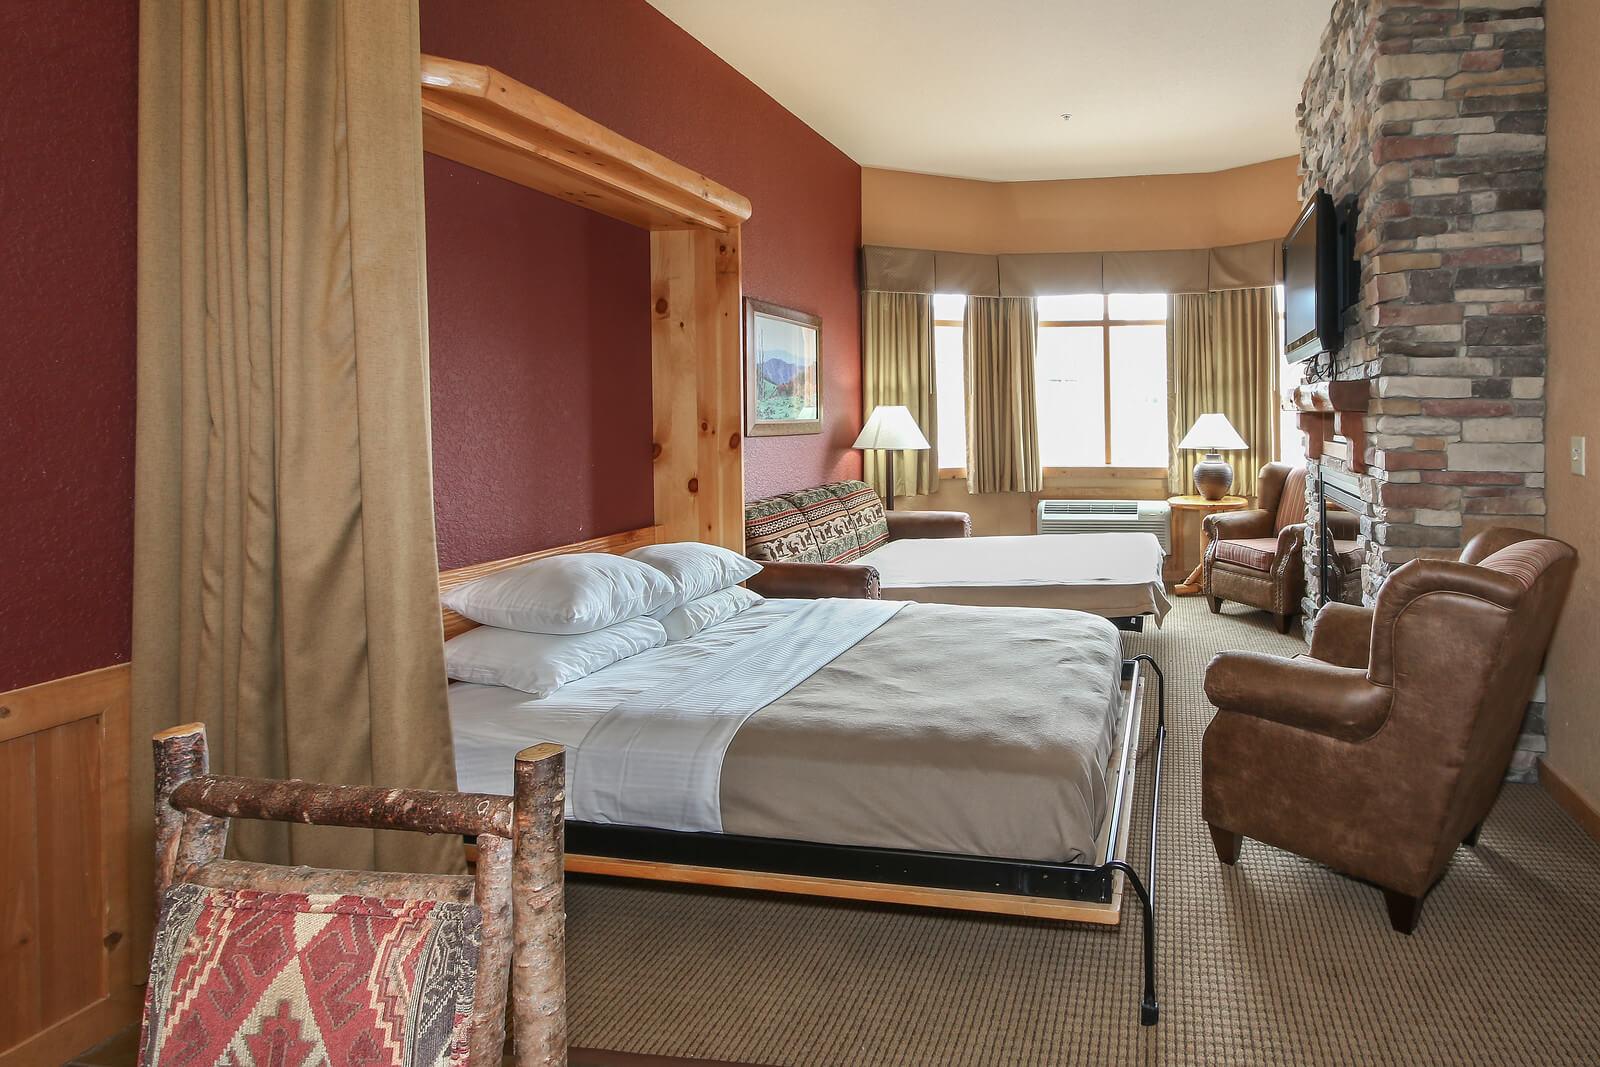 2 Bedroom Premiere Suite Wilderness At The Smokies